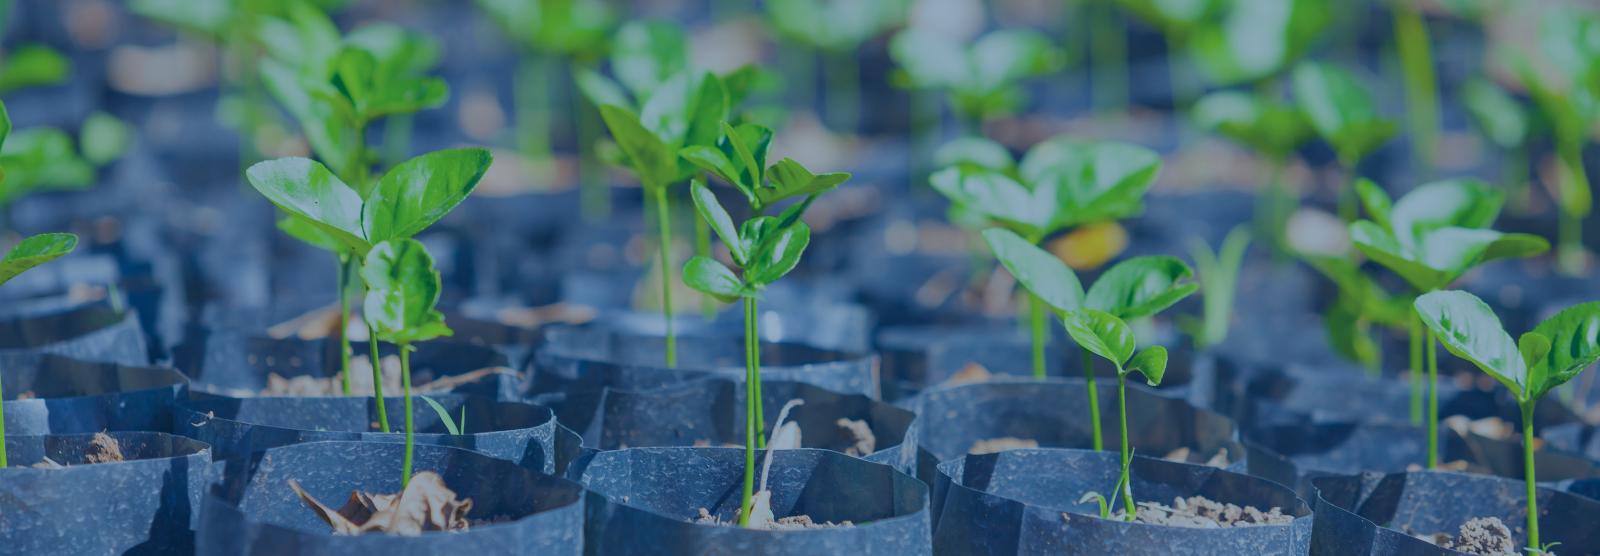 Landing page banner image seedlings 1